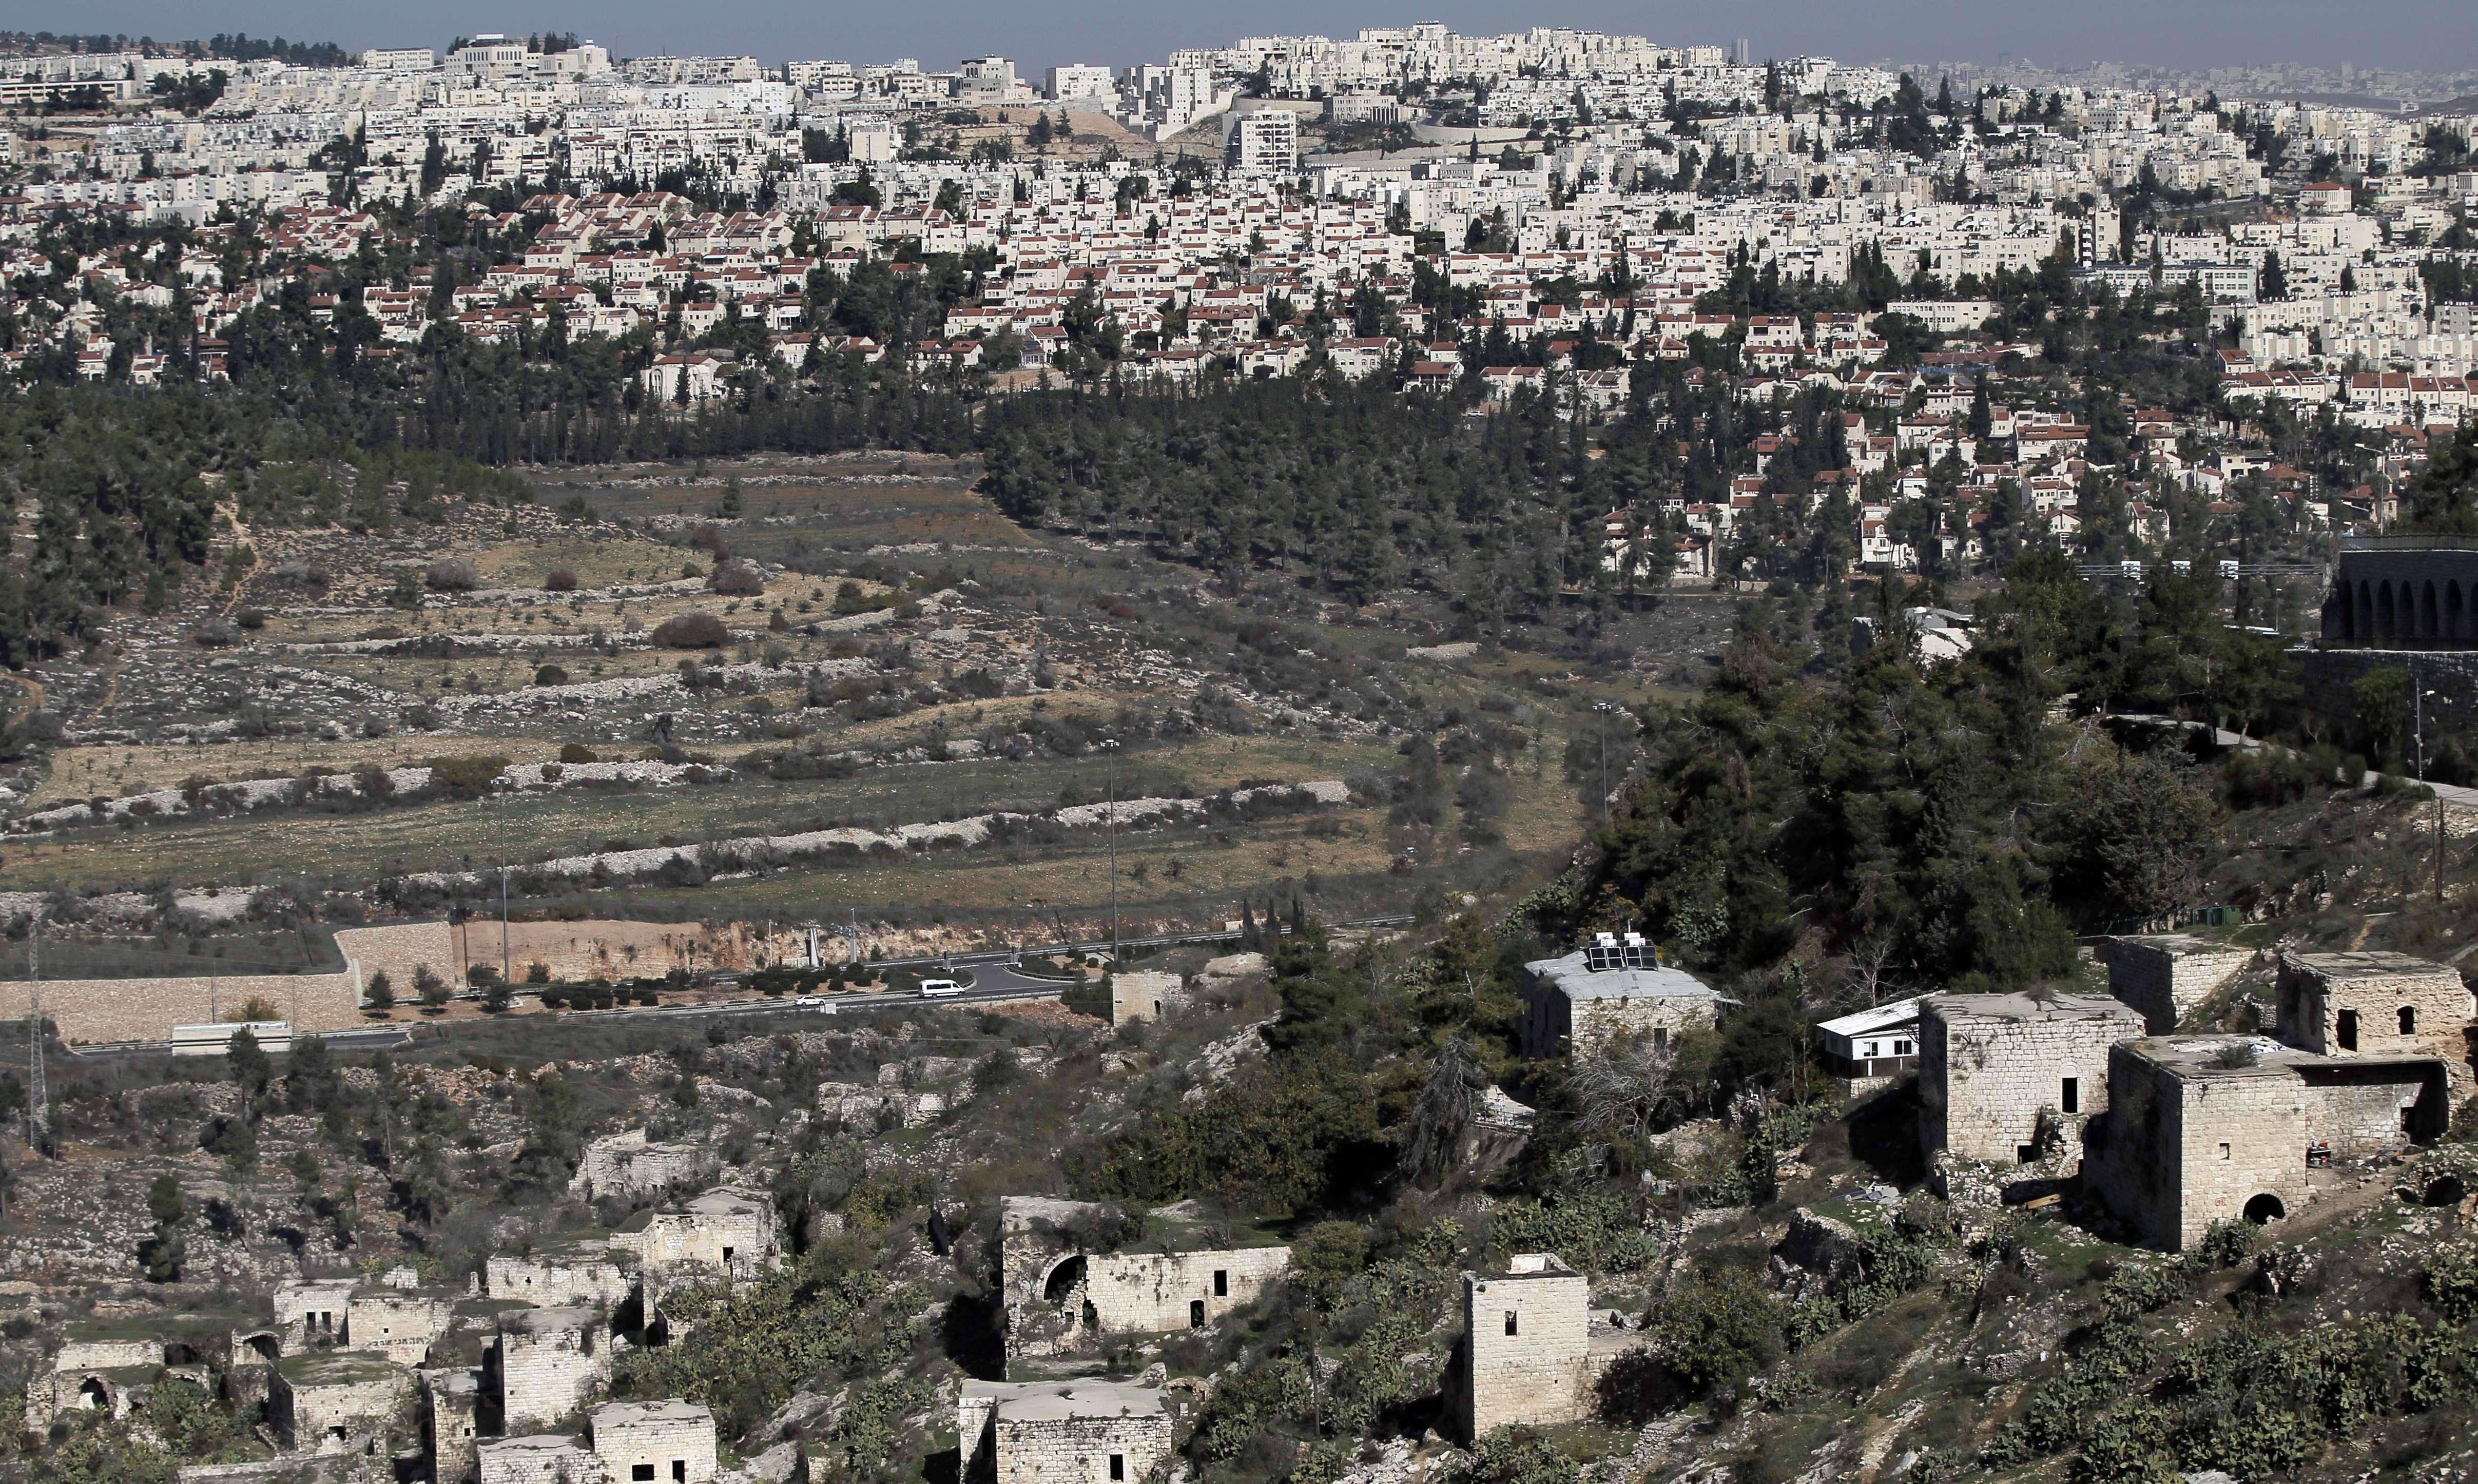 L'UE condamne la politique de colonisation d'Israël